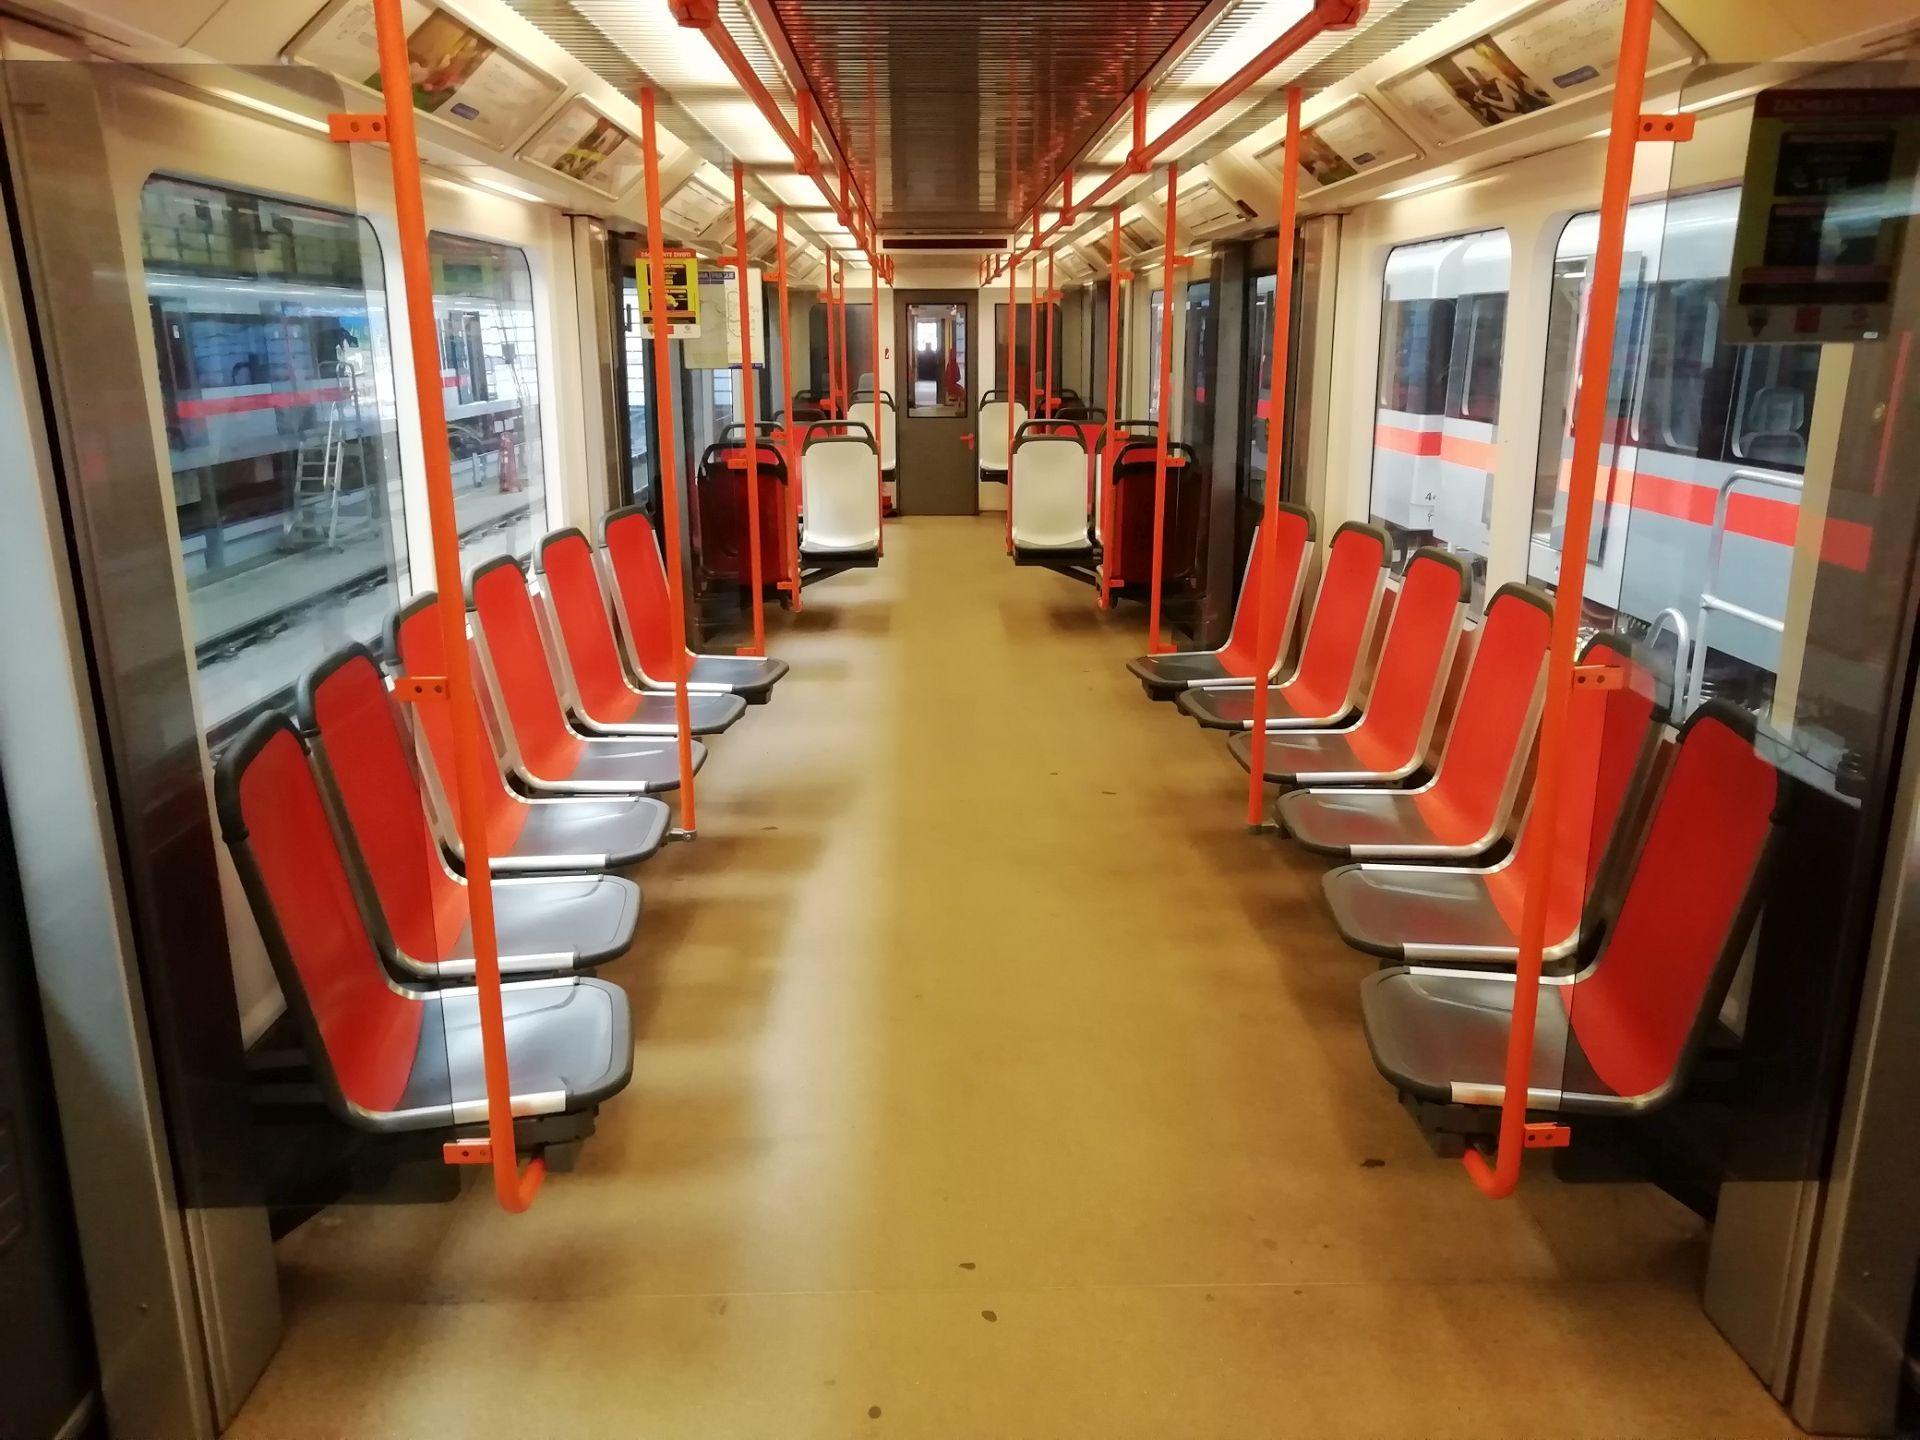 Interiér soupravy metra C s novými sedačkami od firmy Ruspa. Foto: Lukáš Hampacher / DPP